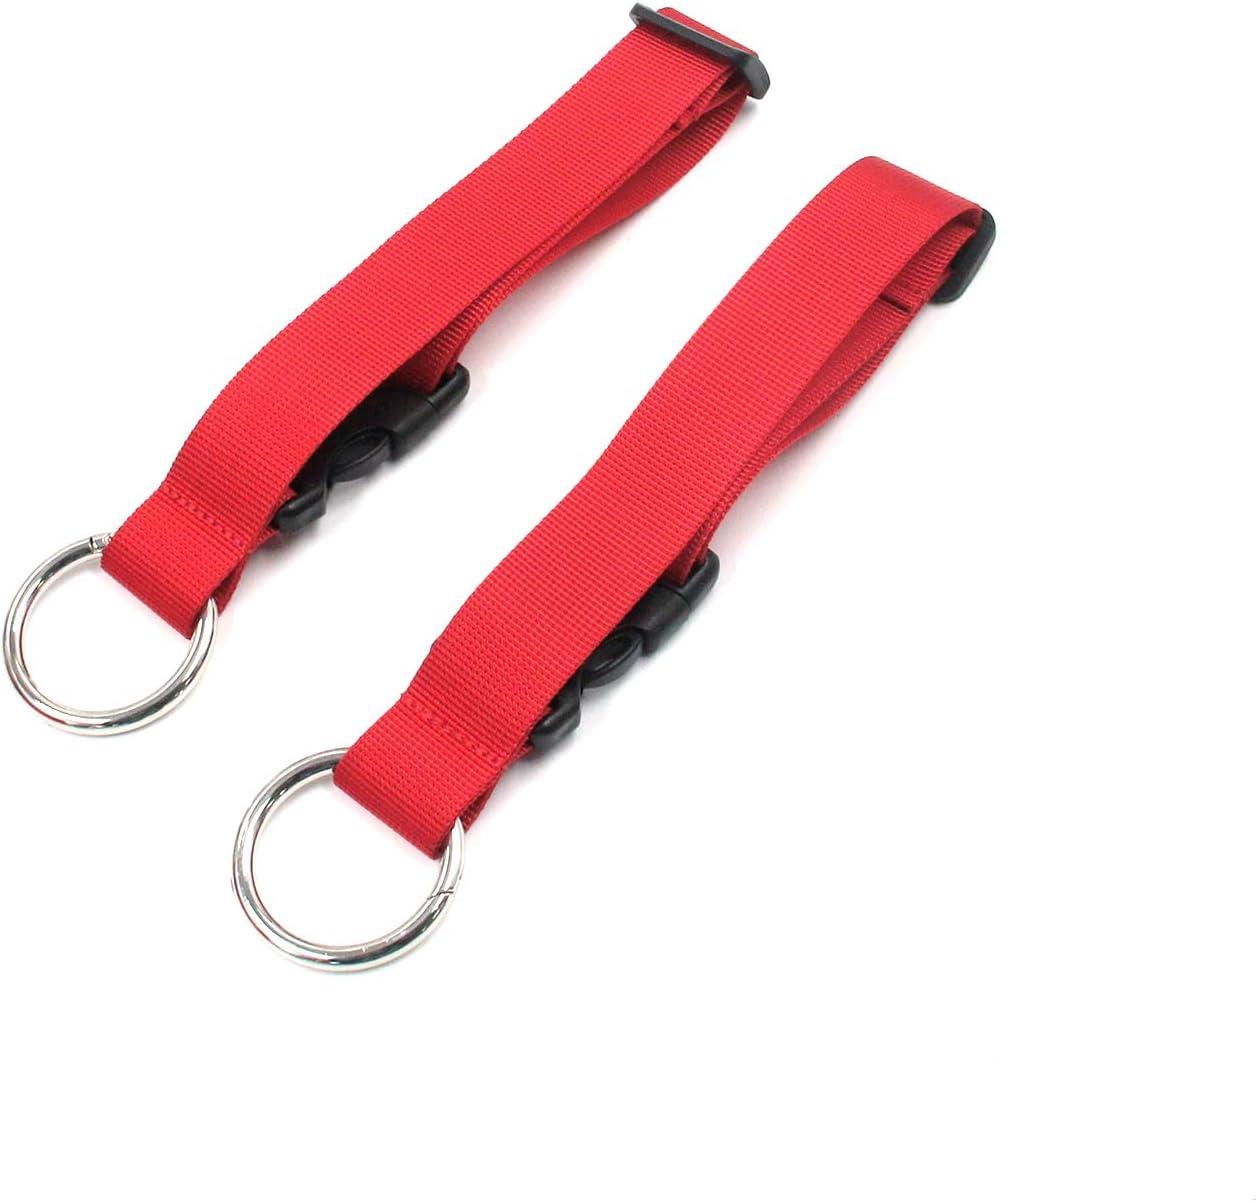 Suitcase Strap Karcy Add Bag Luggage Strap 7.5 Inch Add A Bag Luggage Strap Jacket Gripper Imitation Nylon Red Set of 2